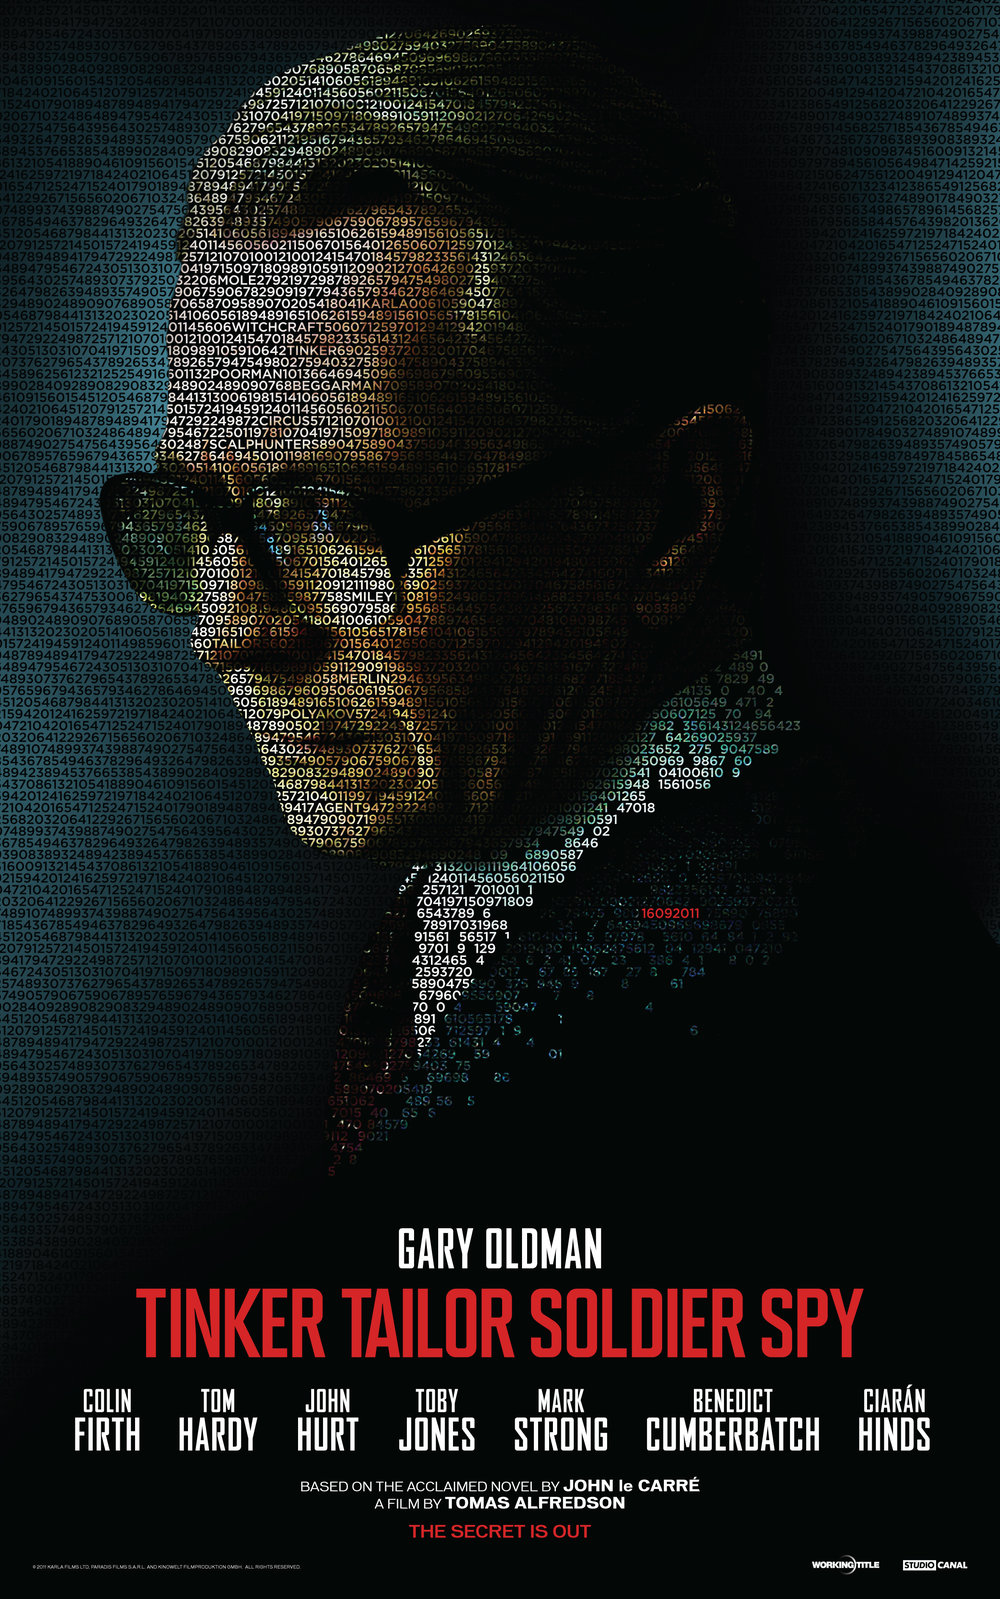 tinker-tailor-soldier-spy-movie-poster-gary-oldman-01.jpg